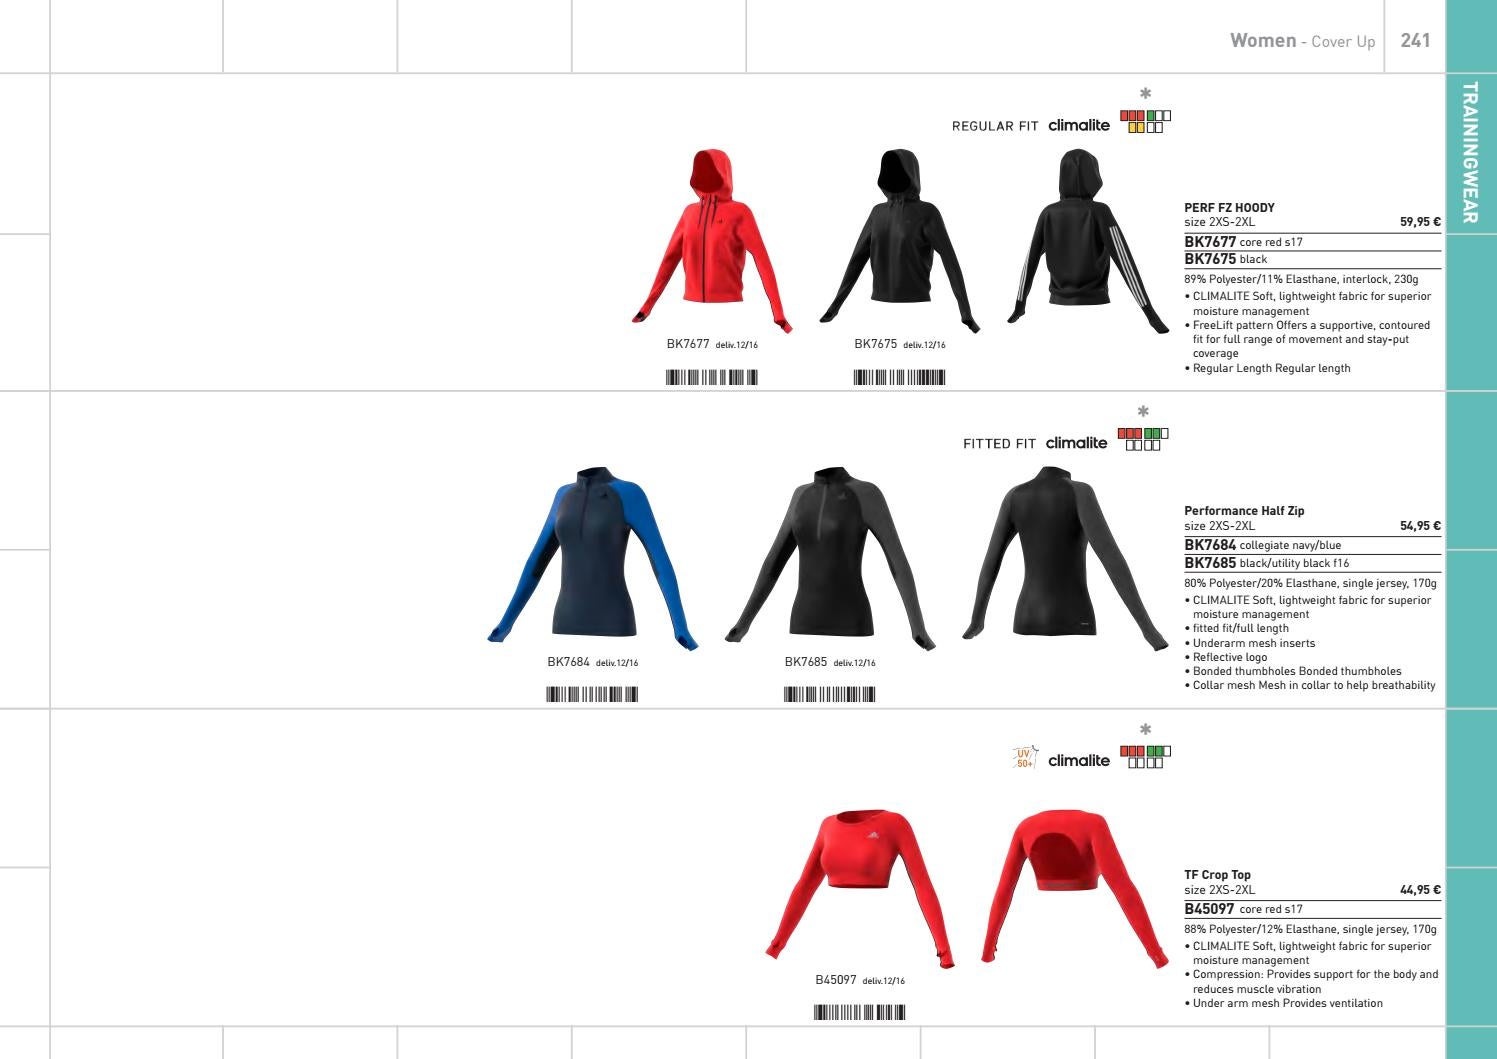 Adidas apparel 2017 q1 by Euroteamsport Vilshofen issuu